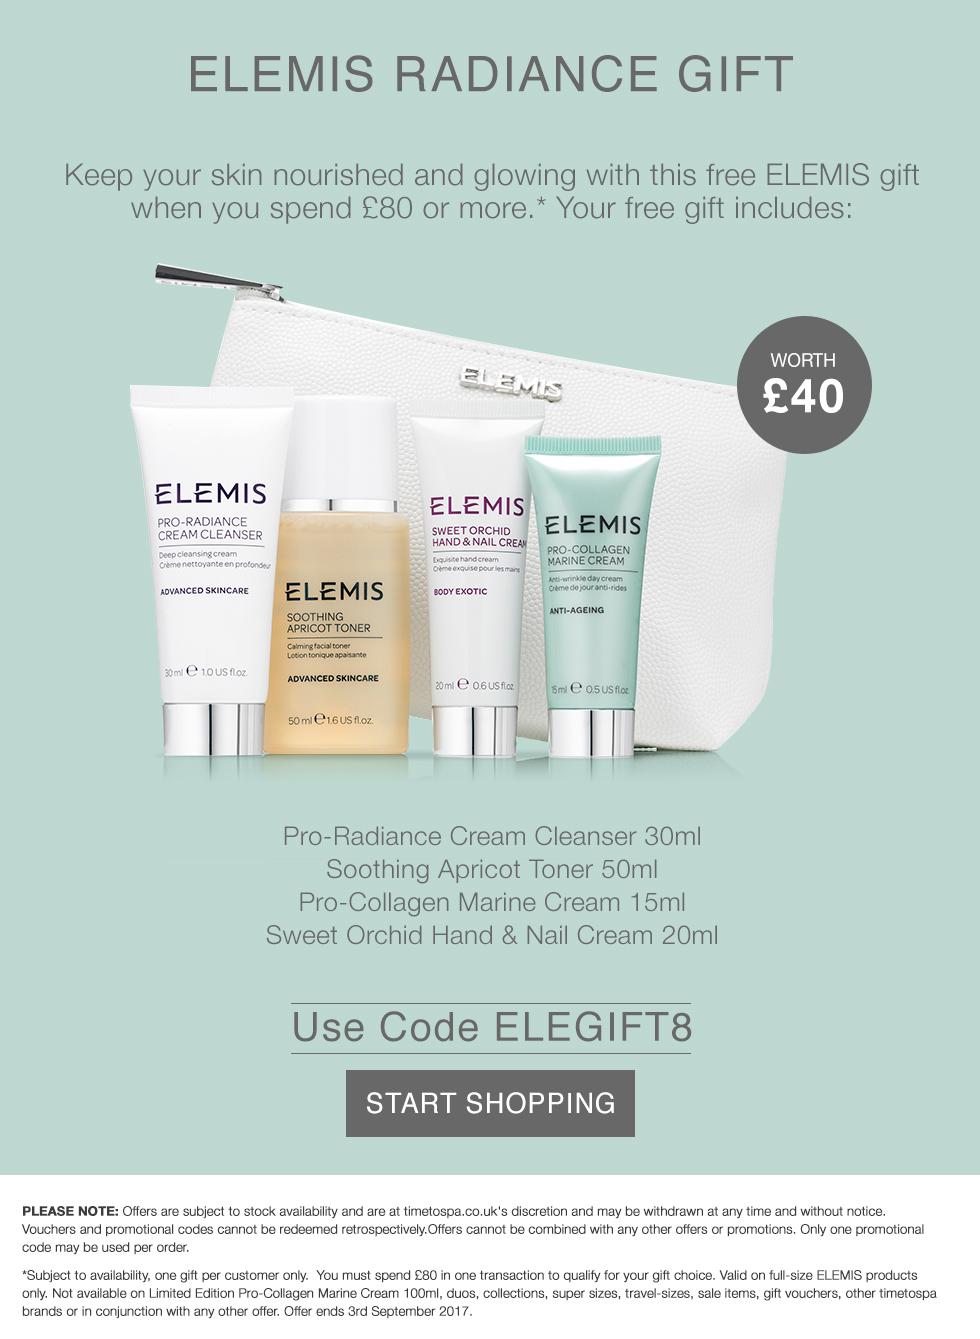 Free ELEMIS Radiance Gift - Worth £30